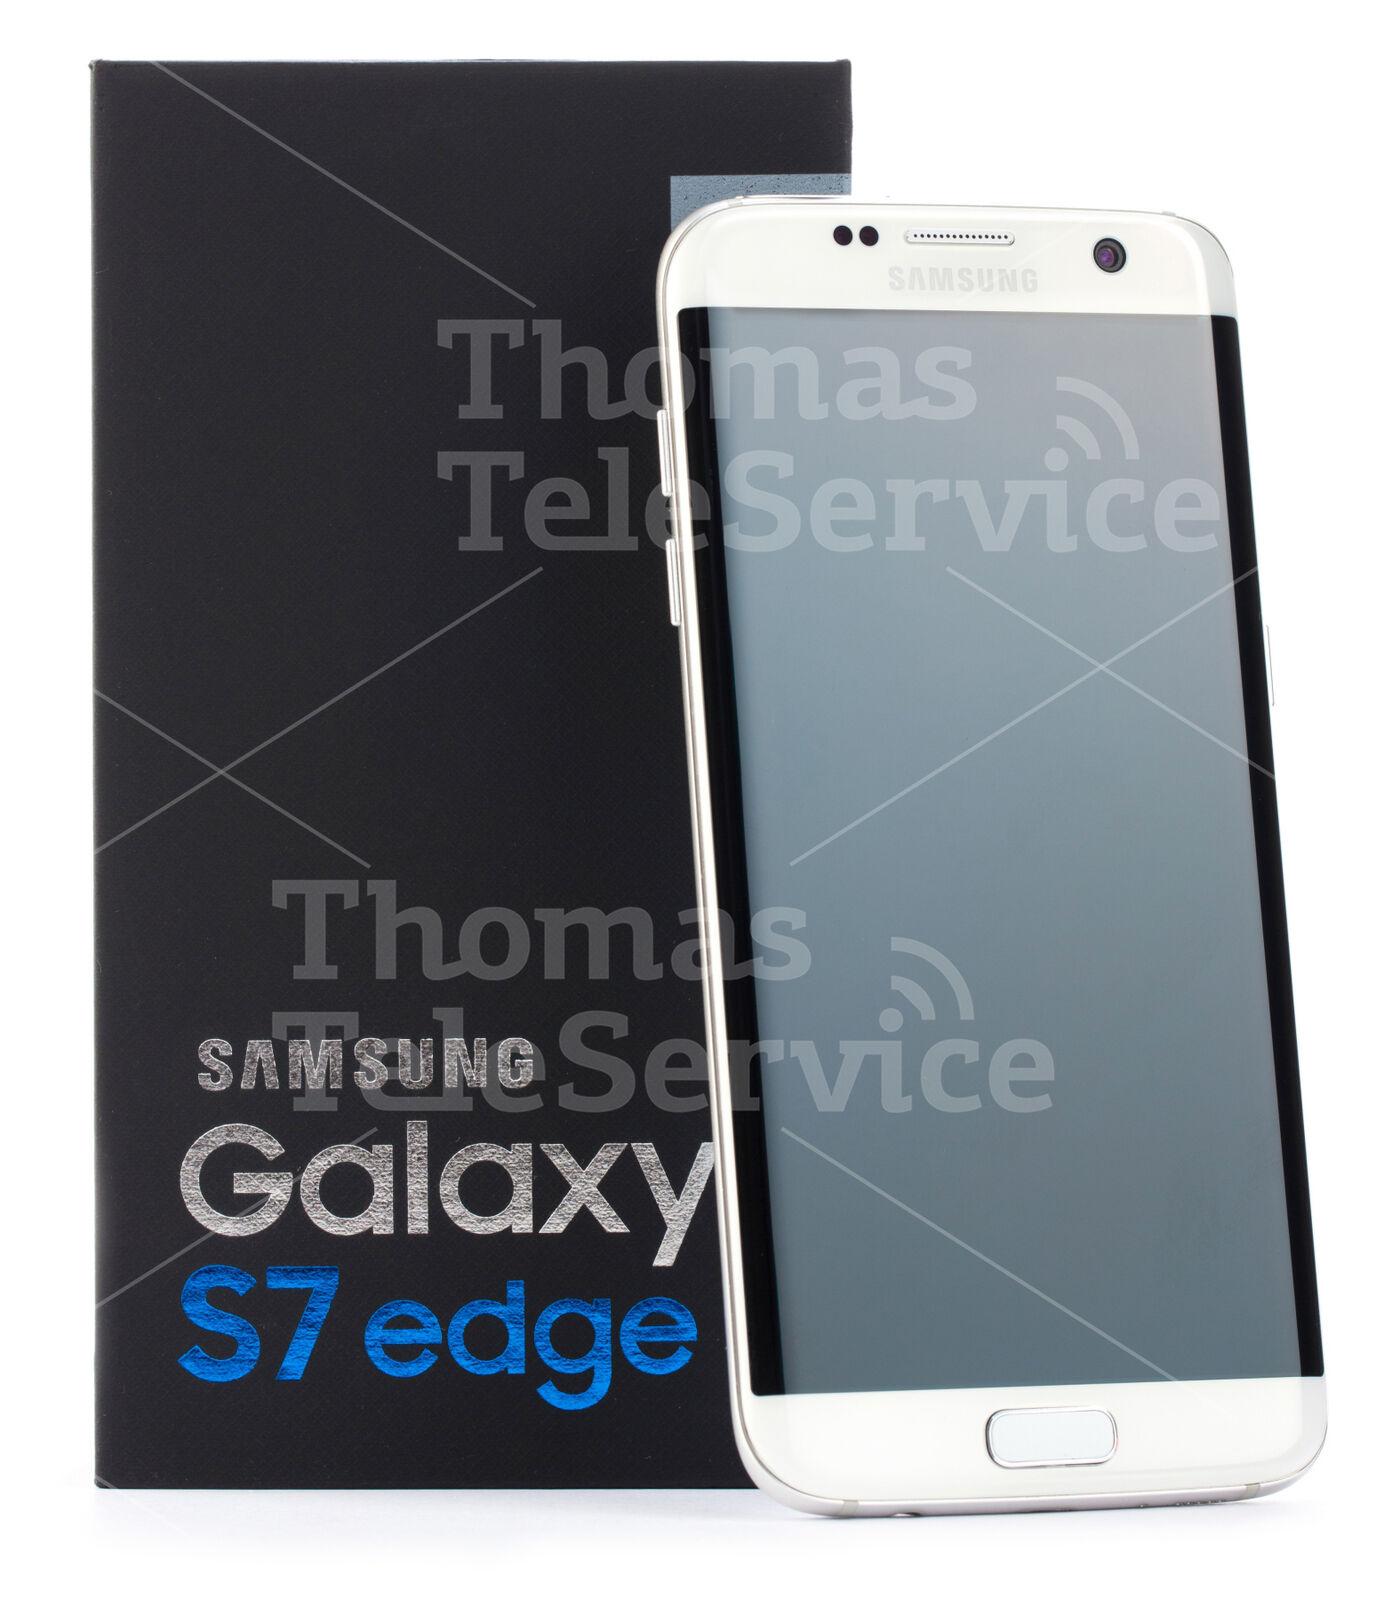 Samsung Galaxy S7 Edge G935f Weiss White Smartphone Handy Android Neu OVP